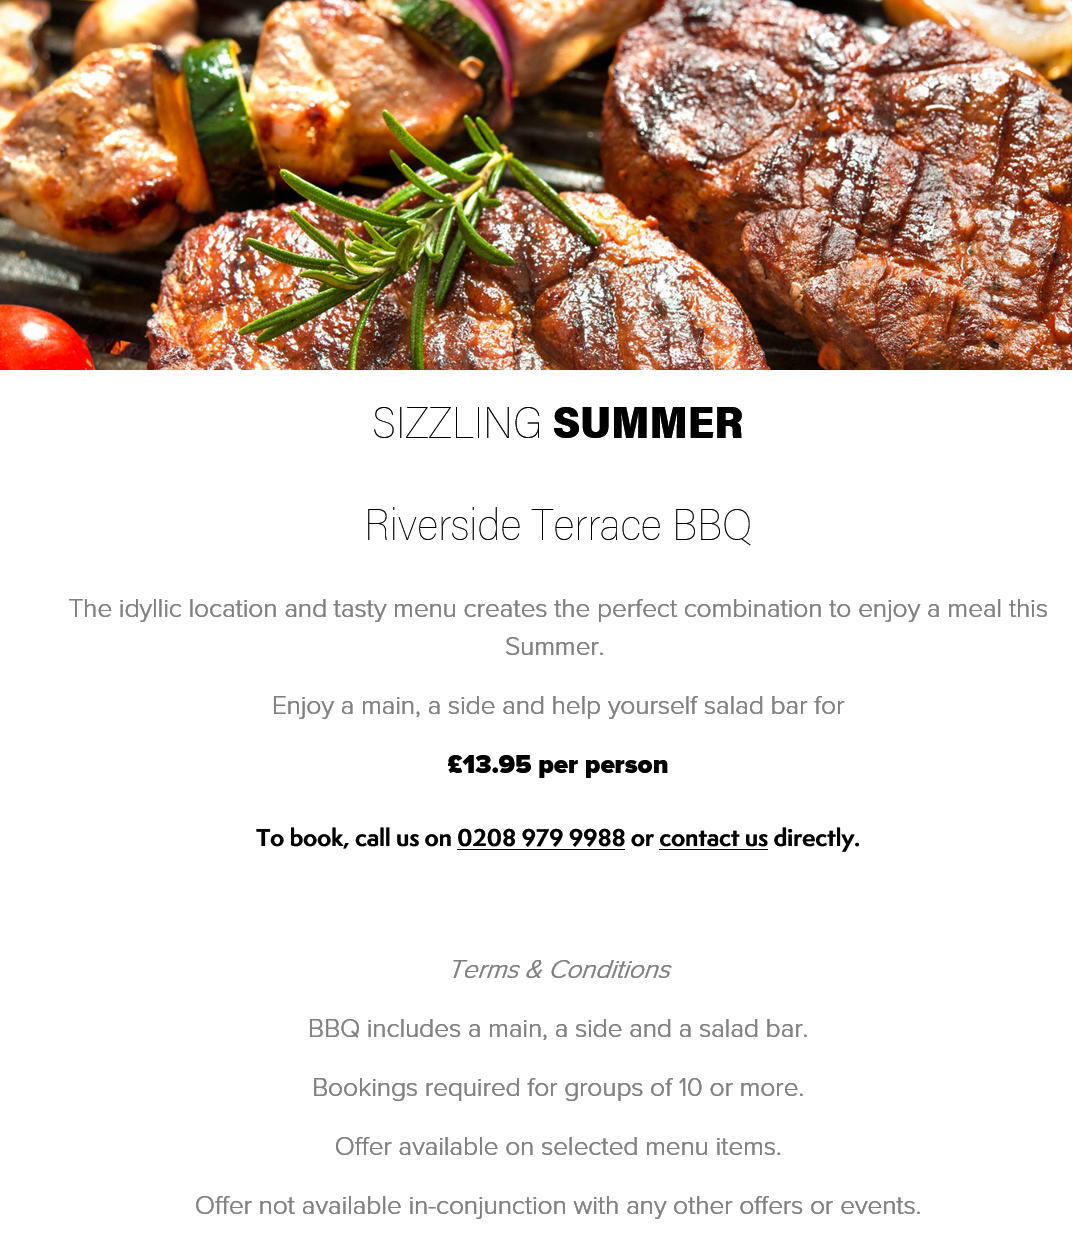 Summer BBQ at the Mitre Hampton Court